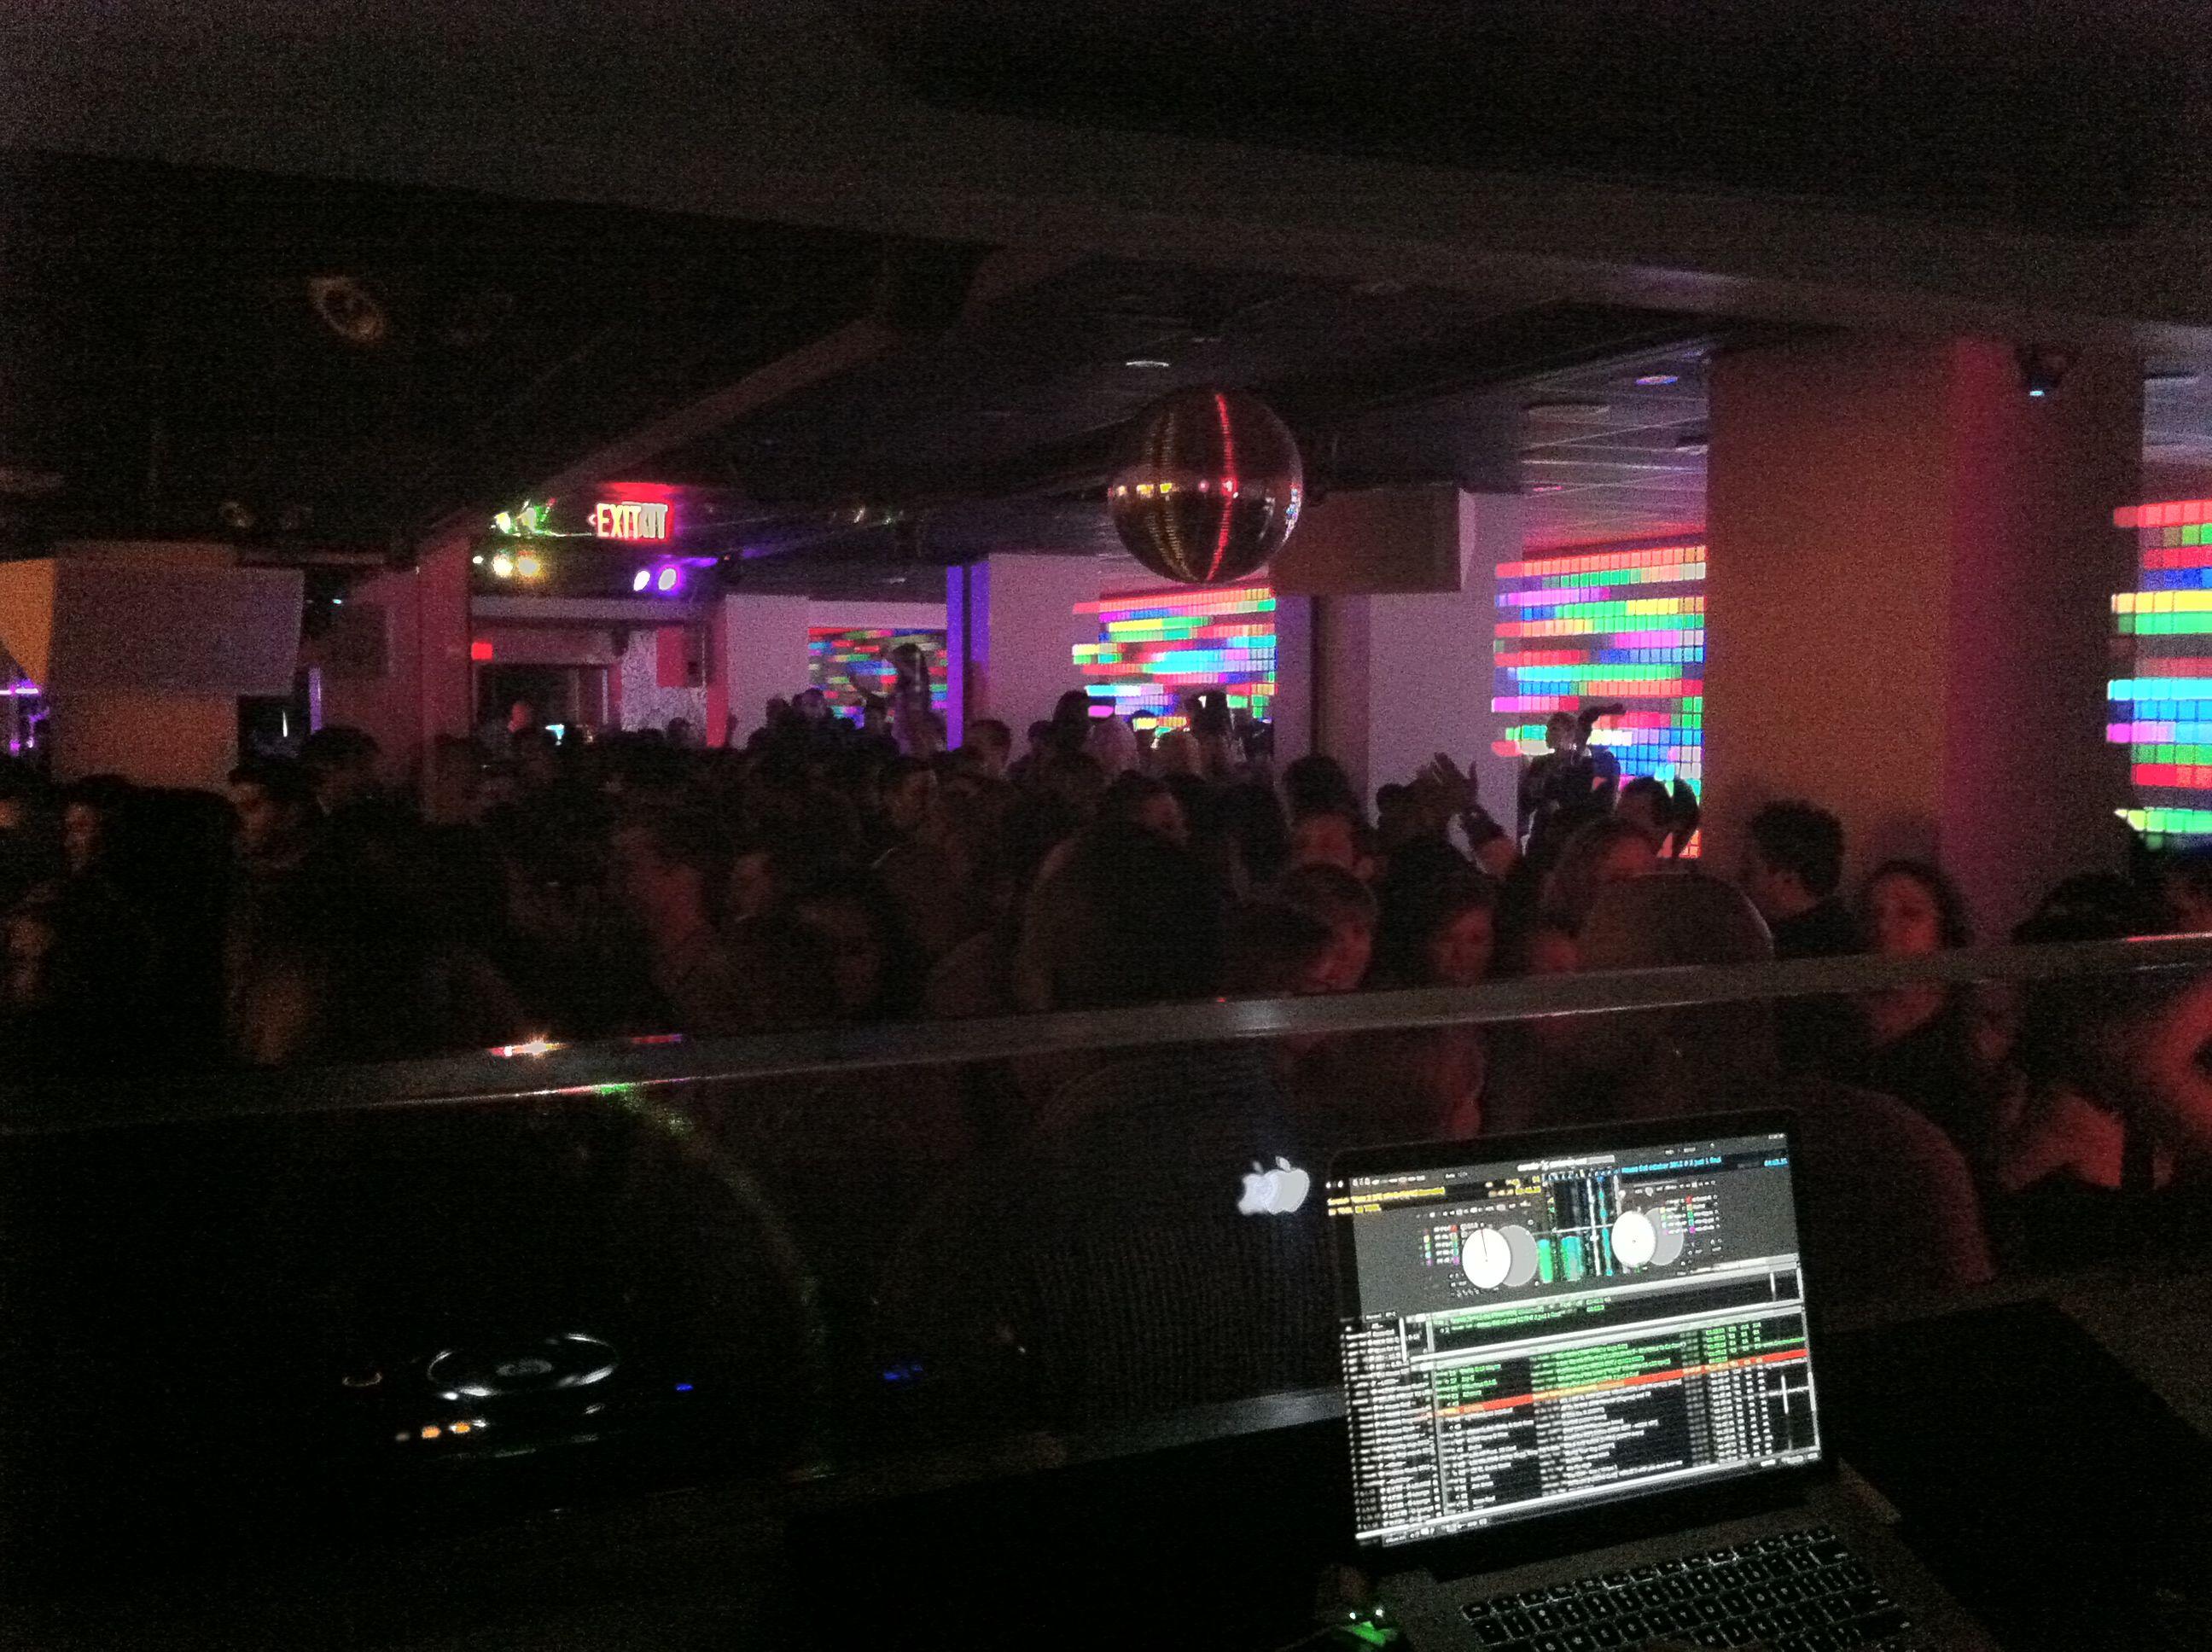 Jam packed on Saturday 10/17 with DJ Virtue